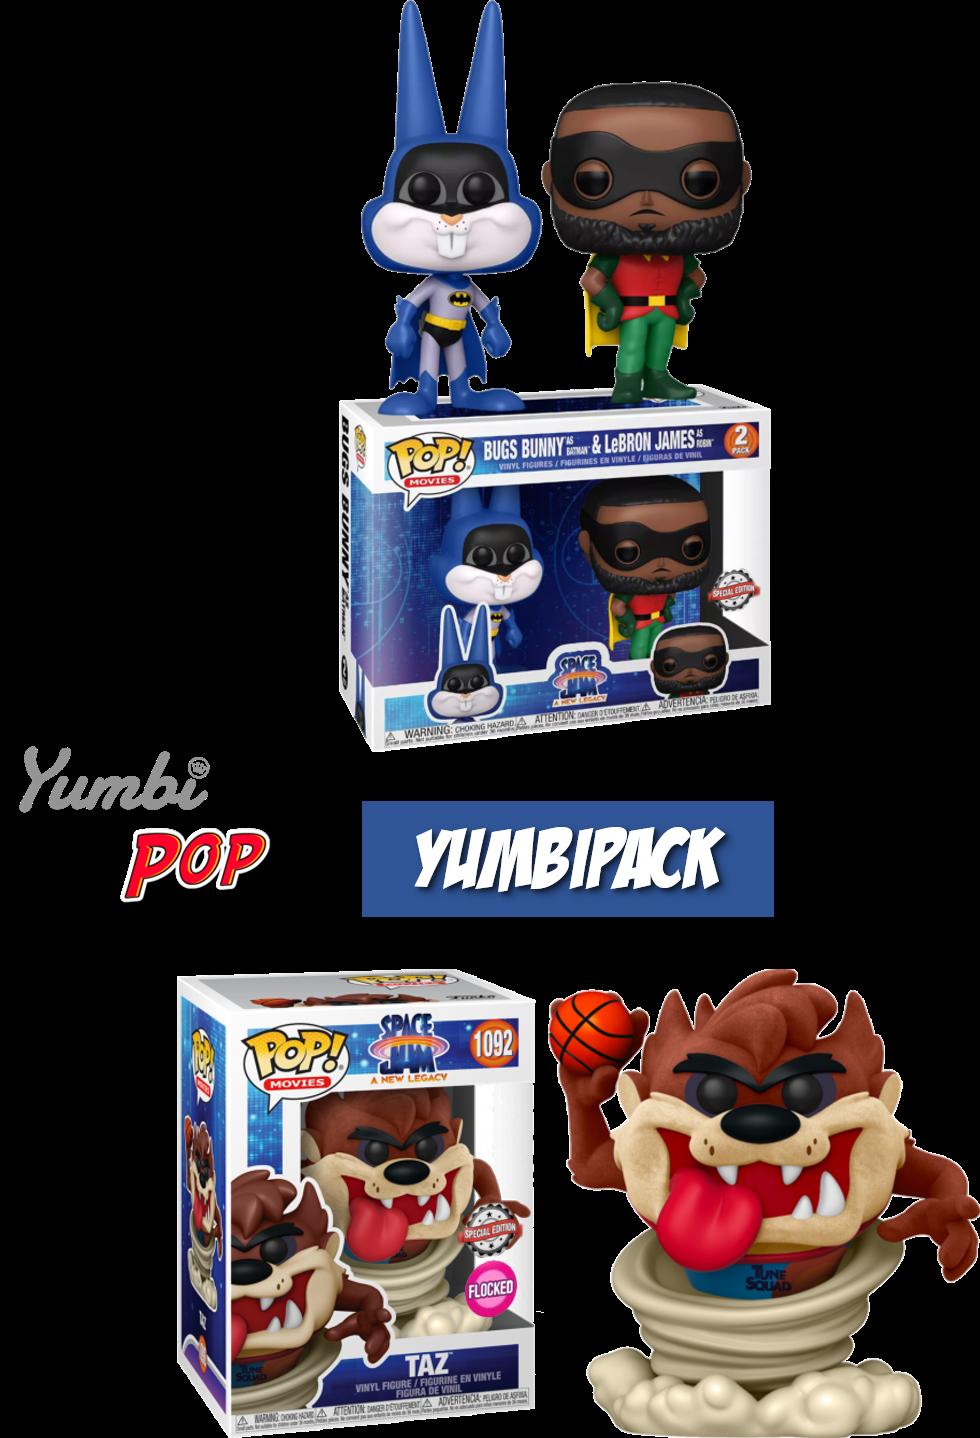 Yumbipack Funko Pop! Lebron & Bugs Bunny + Taz Flocked - Space Jam: A New Legacy